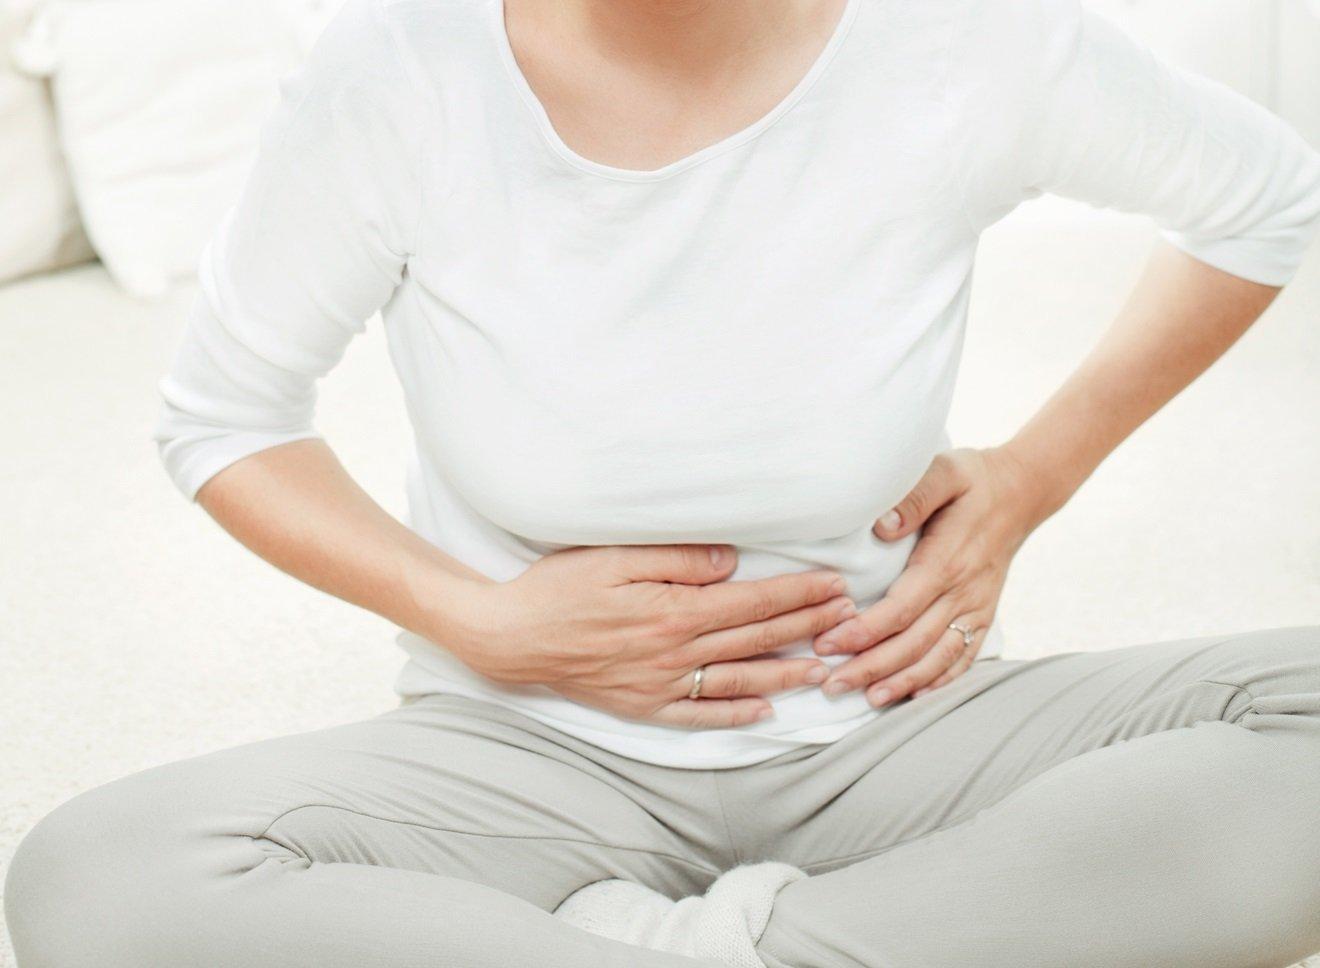 Ce que l'on ressent lors d'une ovulation douloureuse